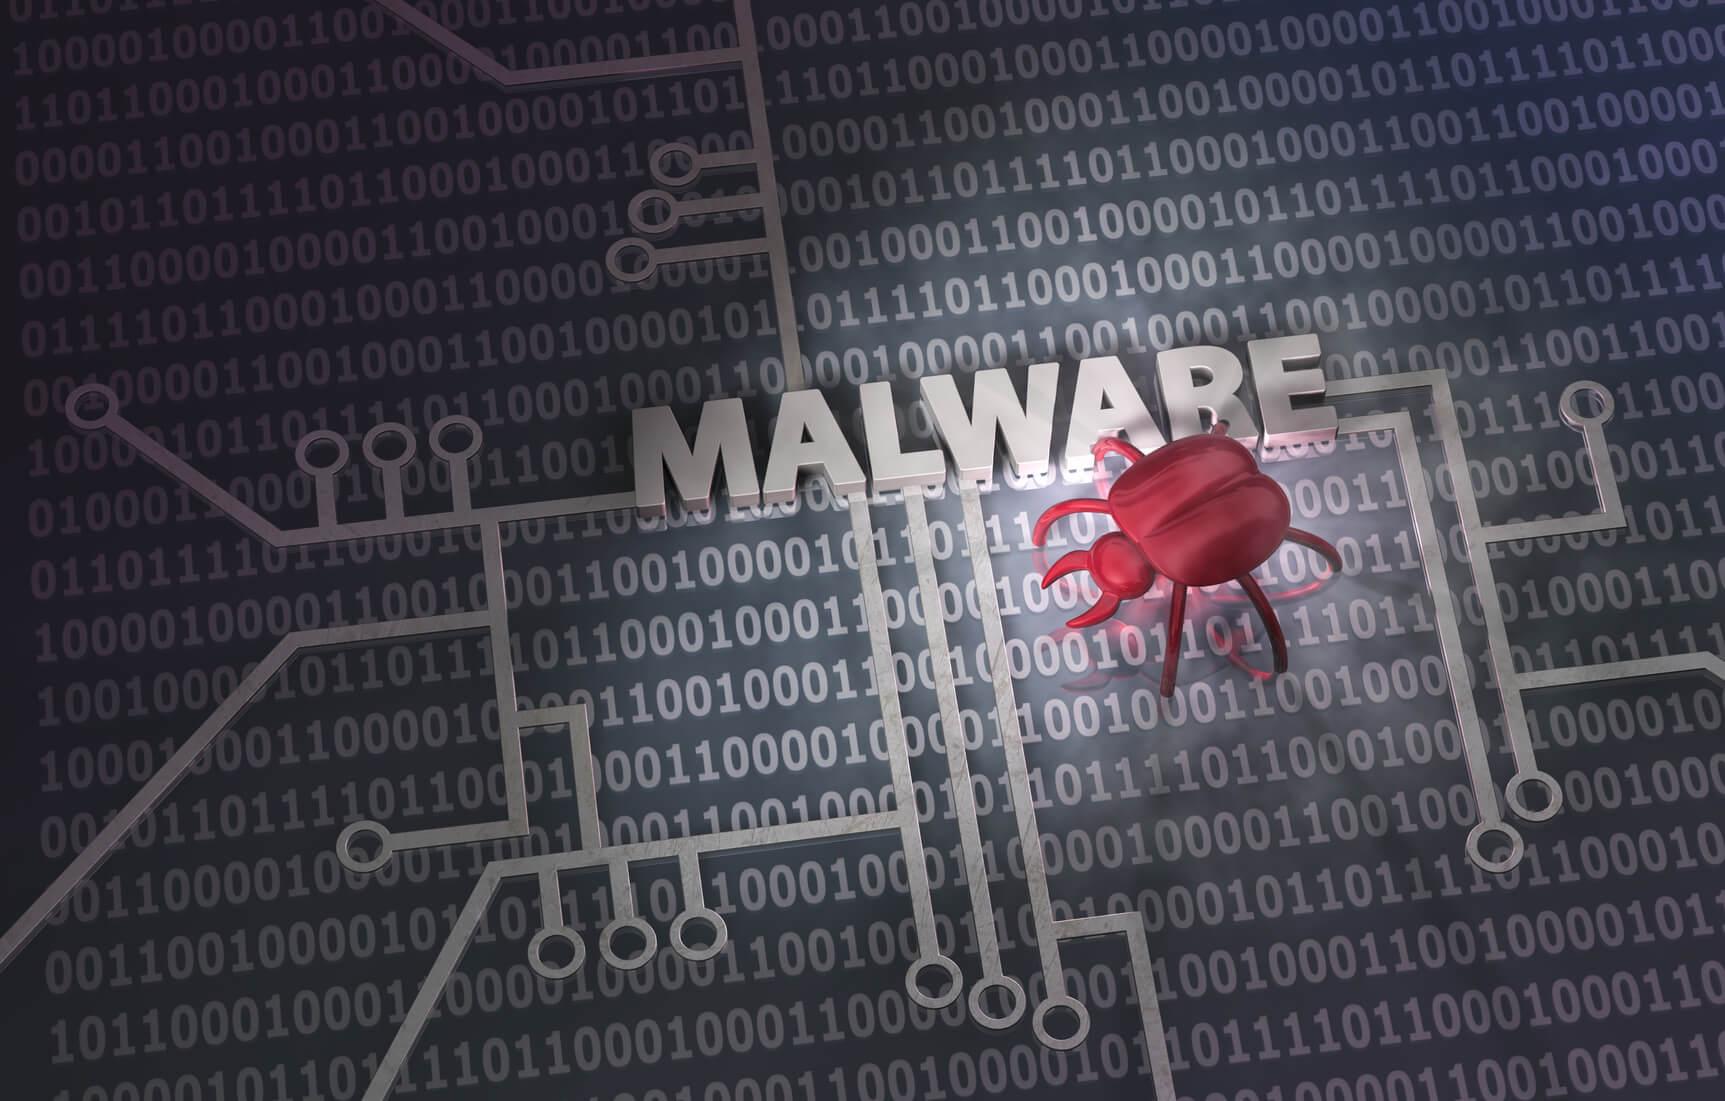 Virenscanner Malware Schriftzug